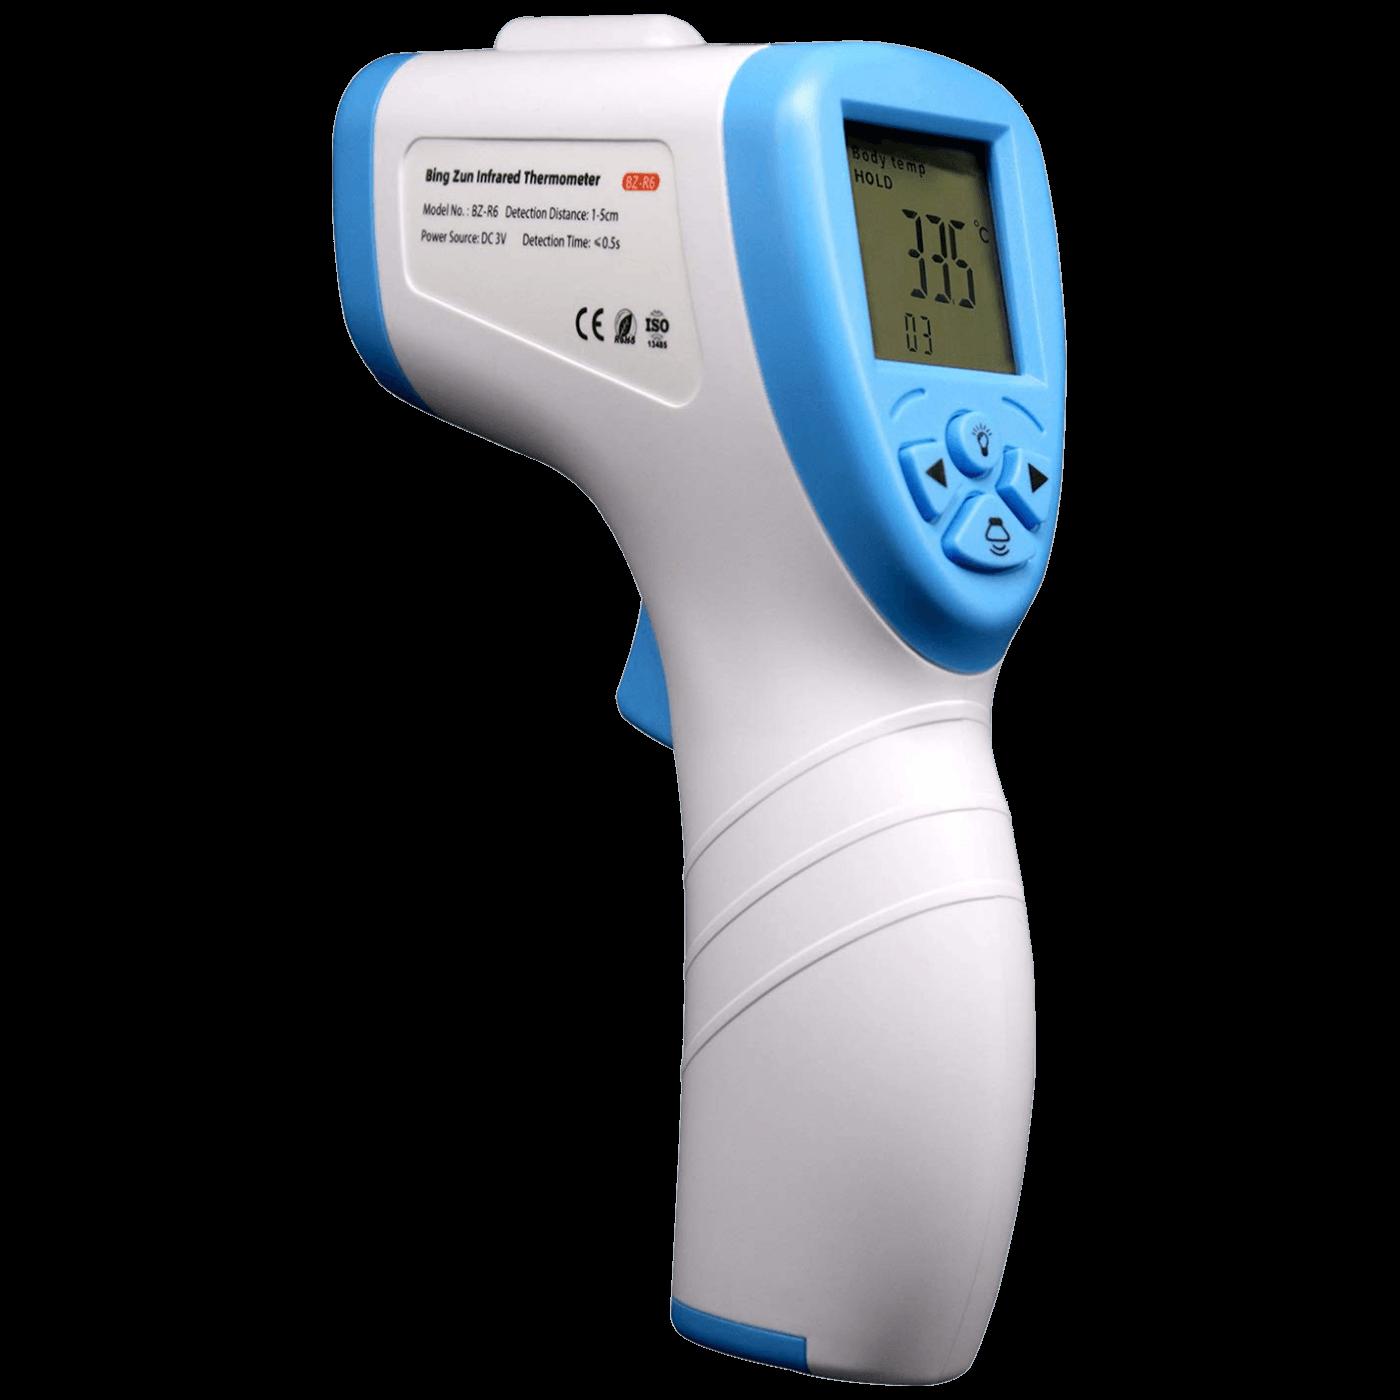 Bezkontakni termometar sa baterijom